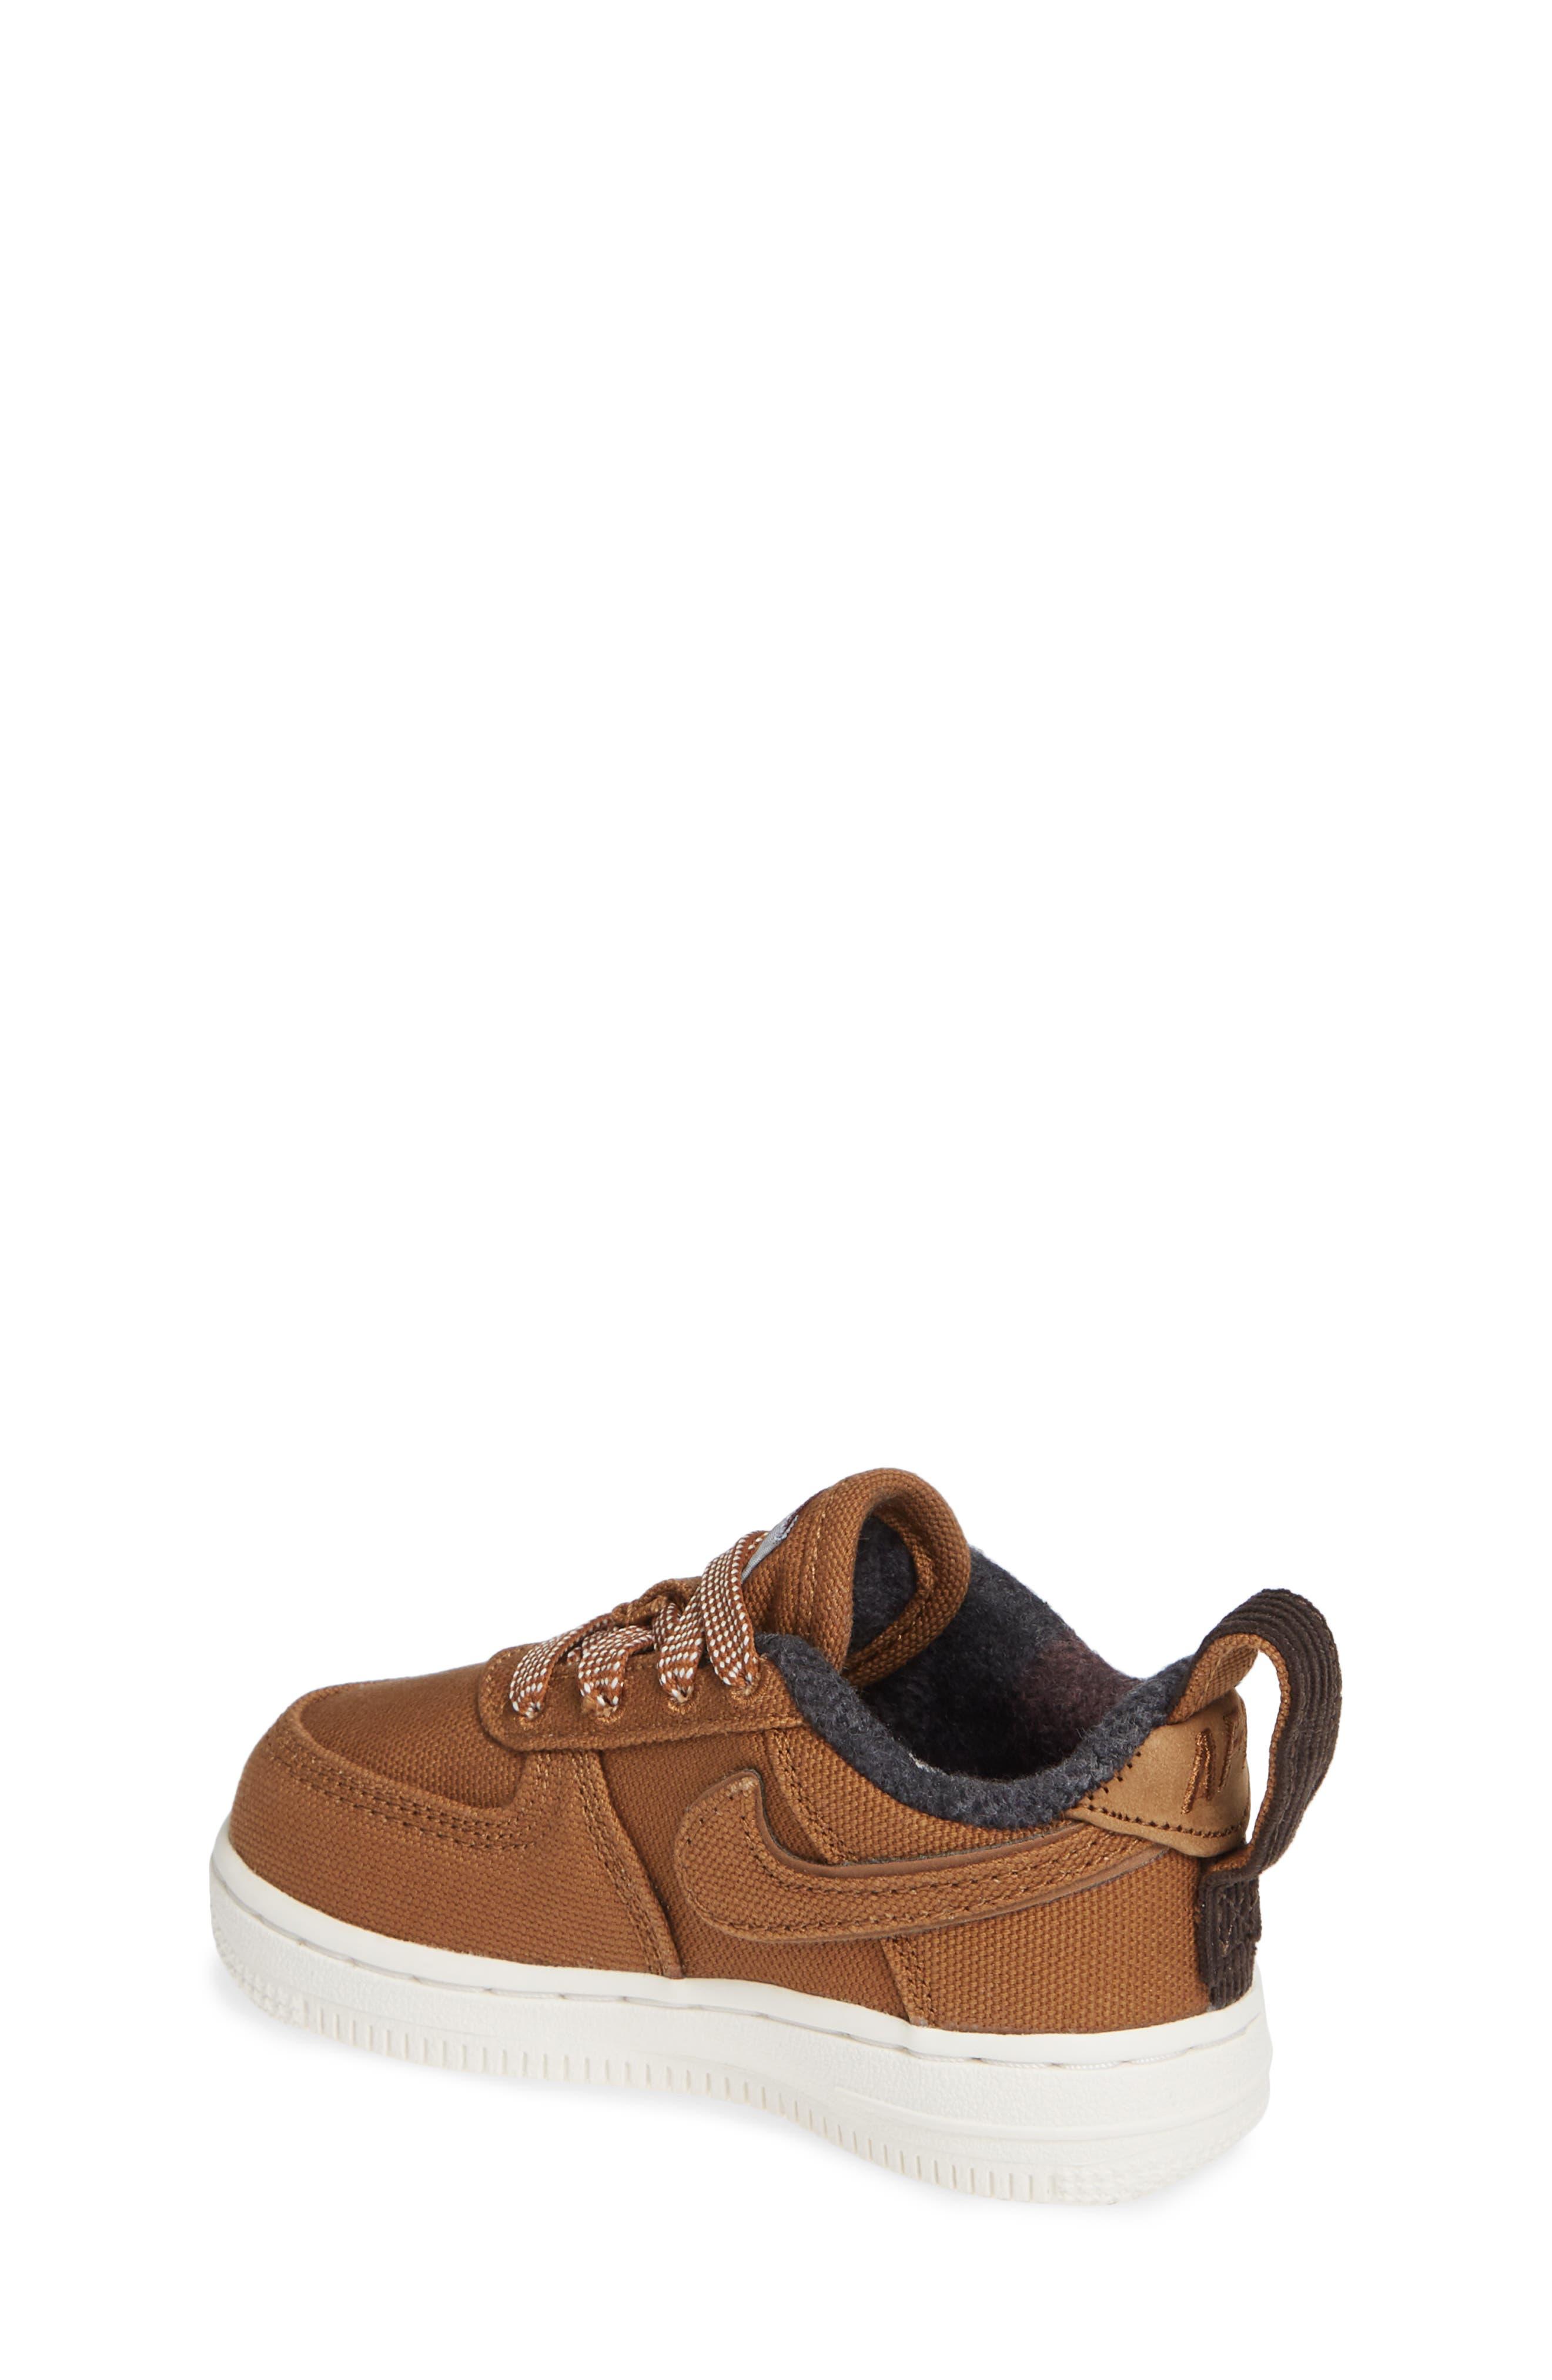 x Carhartt Air Force 1 Premium Sneaker,                             Alternate thumbnail 2, color,                             ALE BROWN/ ALE BROWN-SAIL